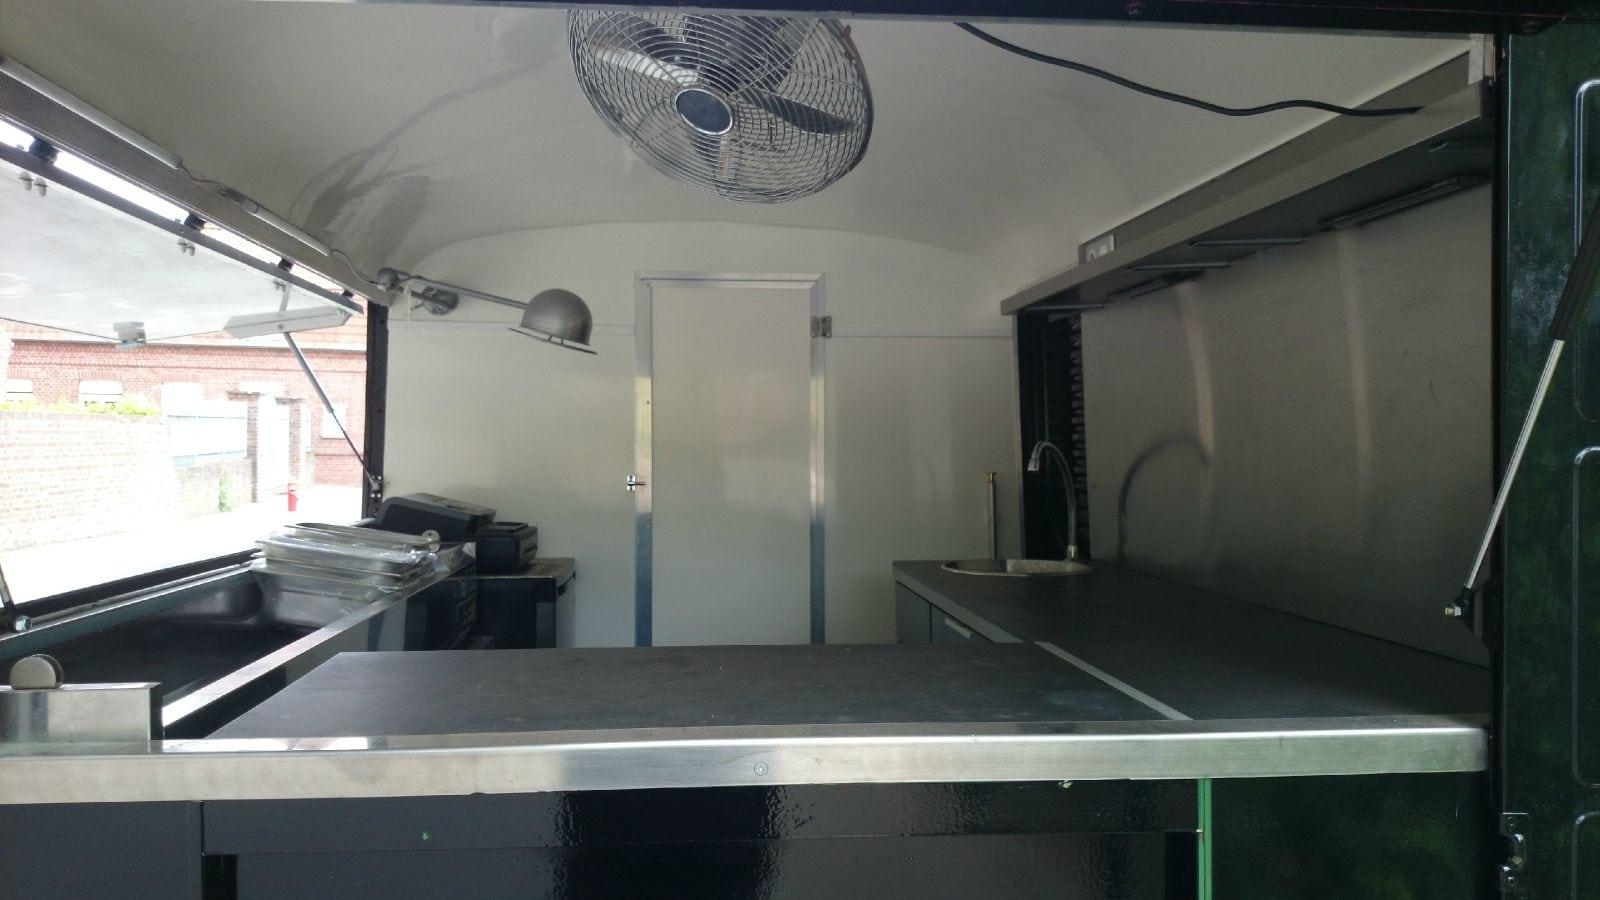 Transformation d'un HY Camping Car en Truck Food GroteFoto-RTGBYSOX